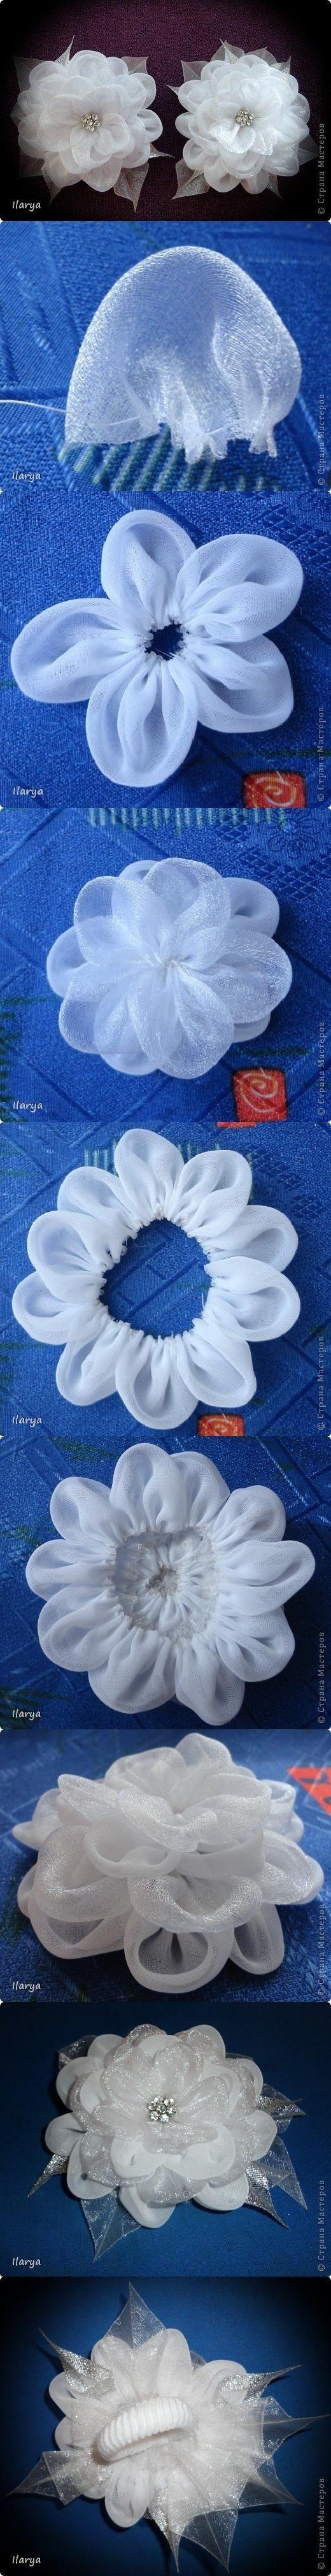 24 best crafts images on Pinterest